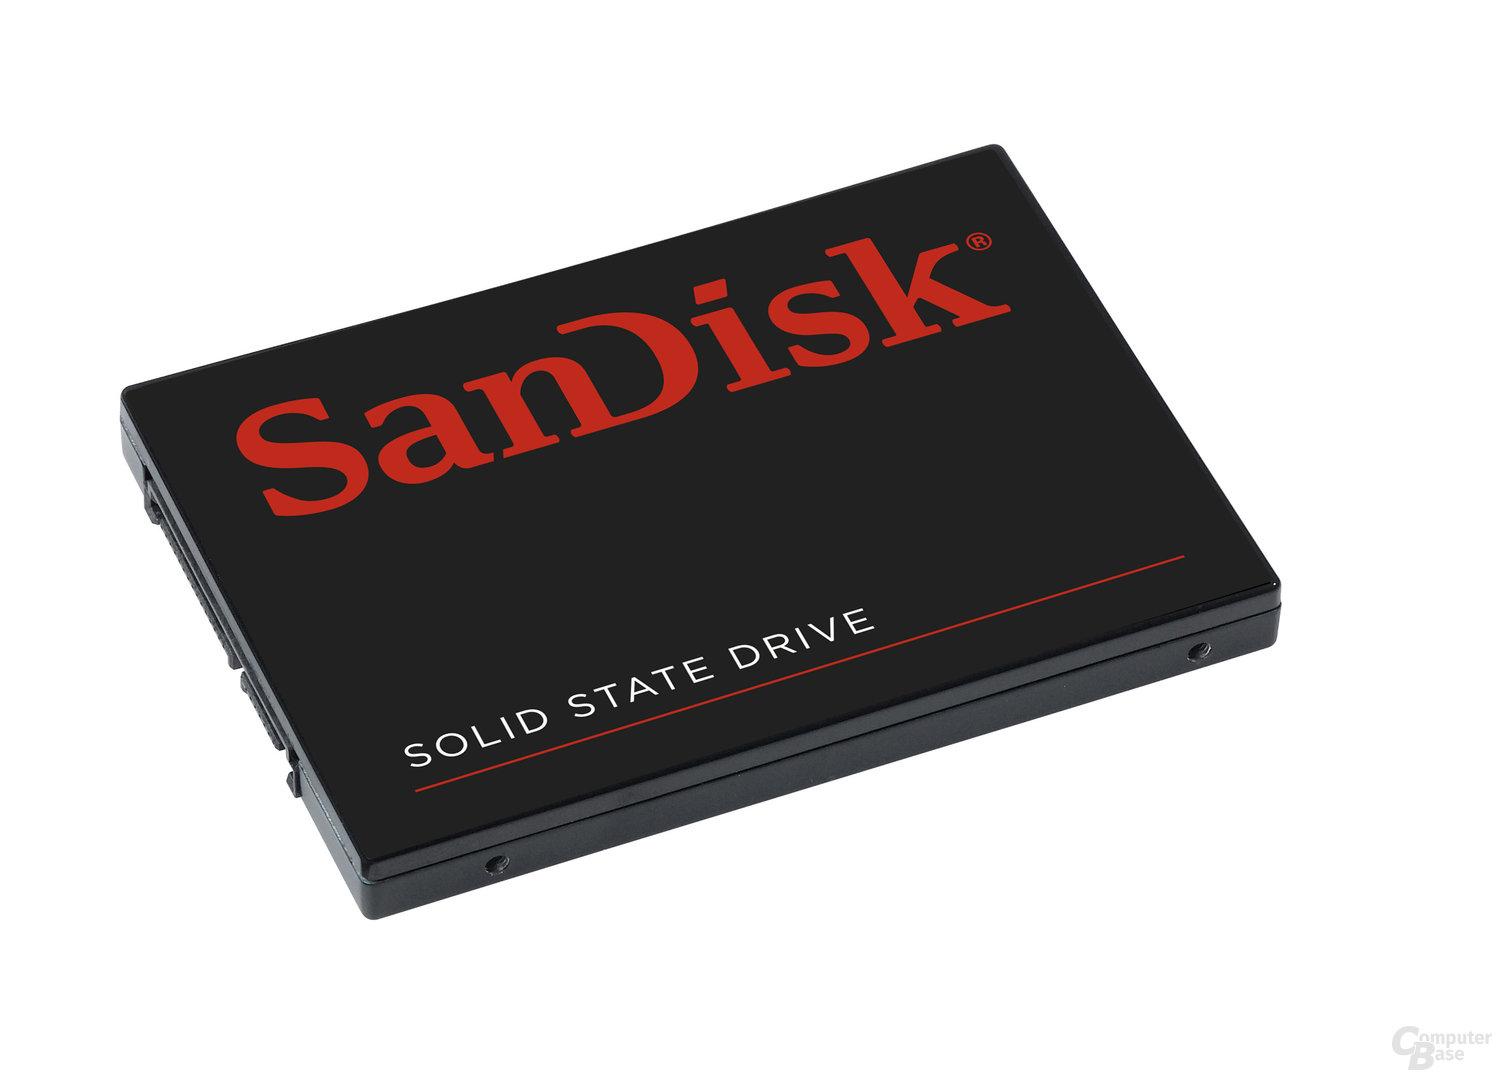 SanDisk G3